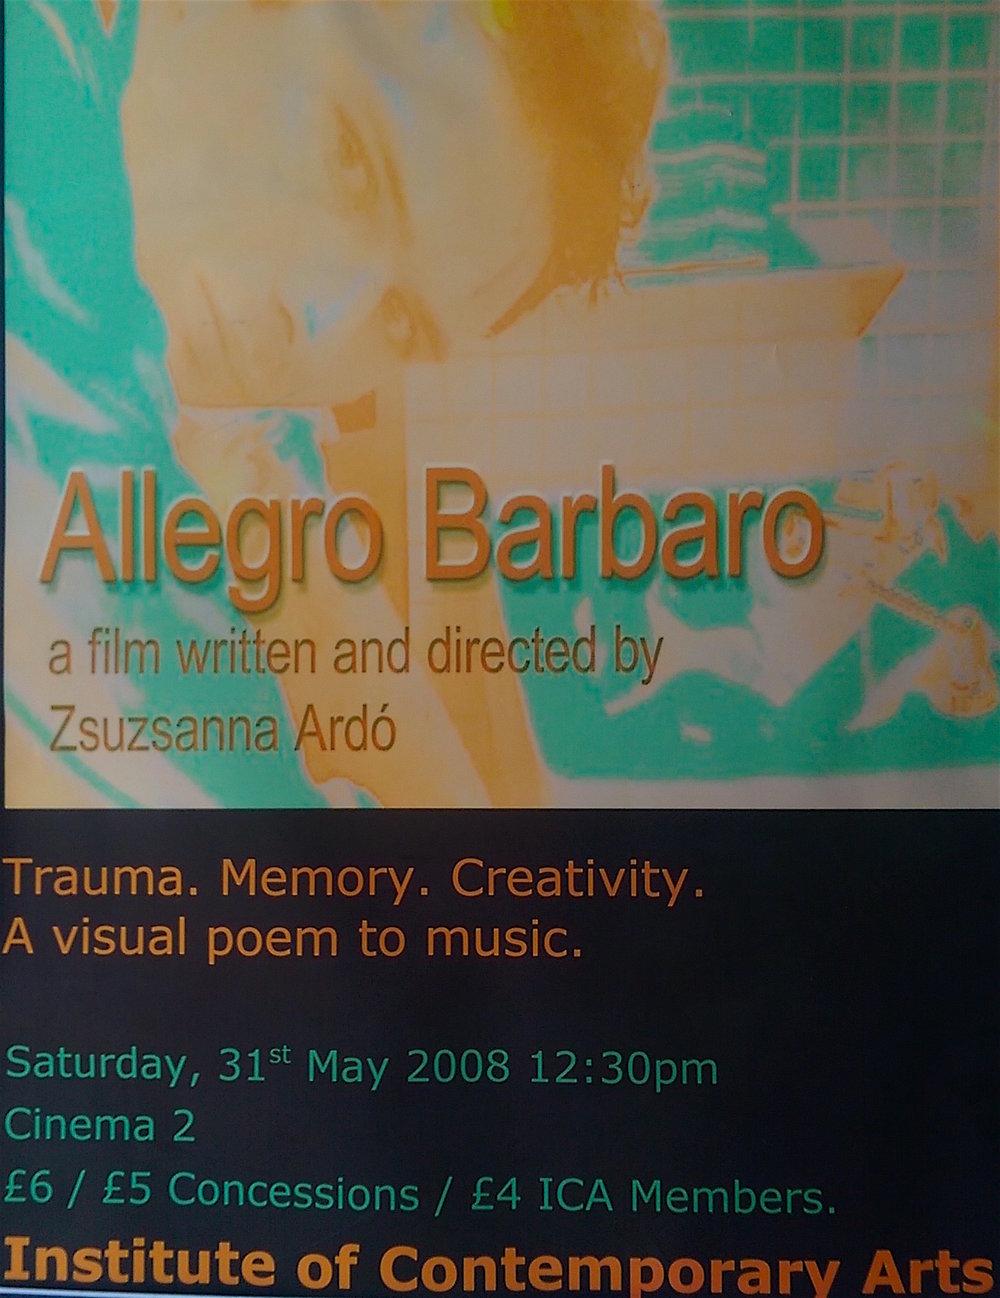 08 uk lon ica Allegro barbaro screening poster©Ardó.jpg